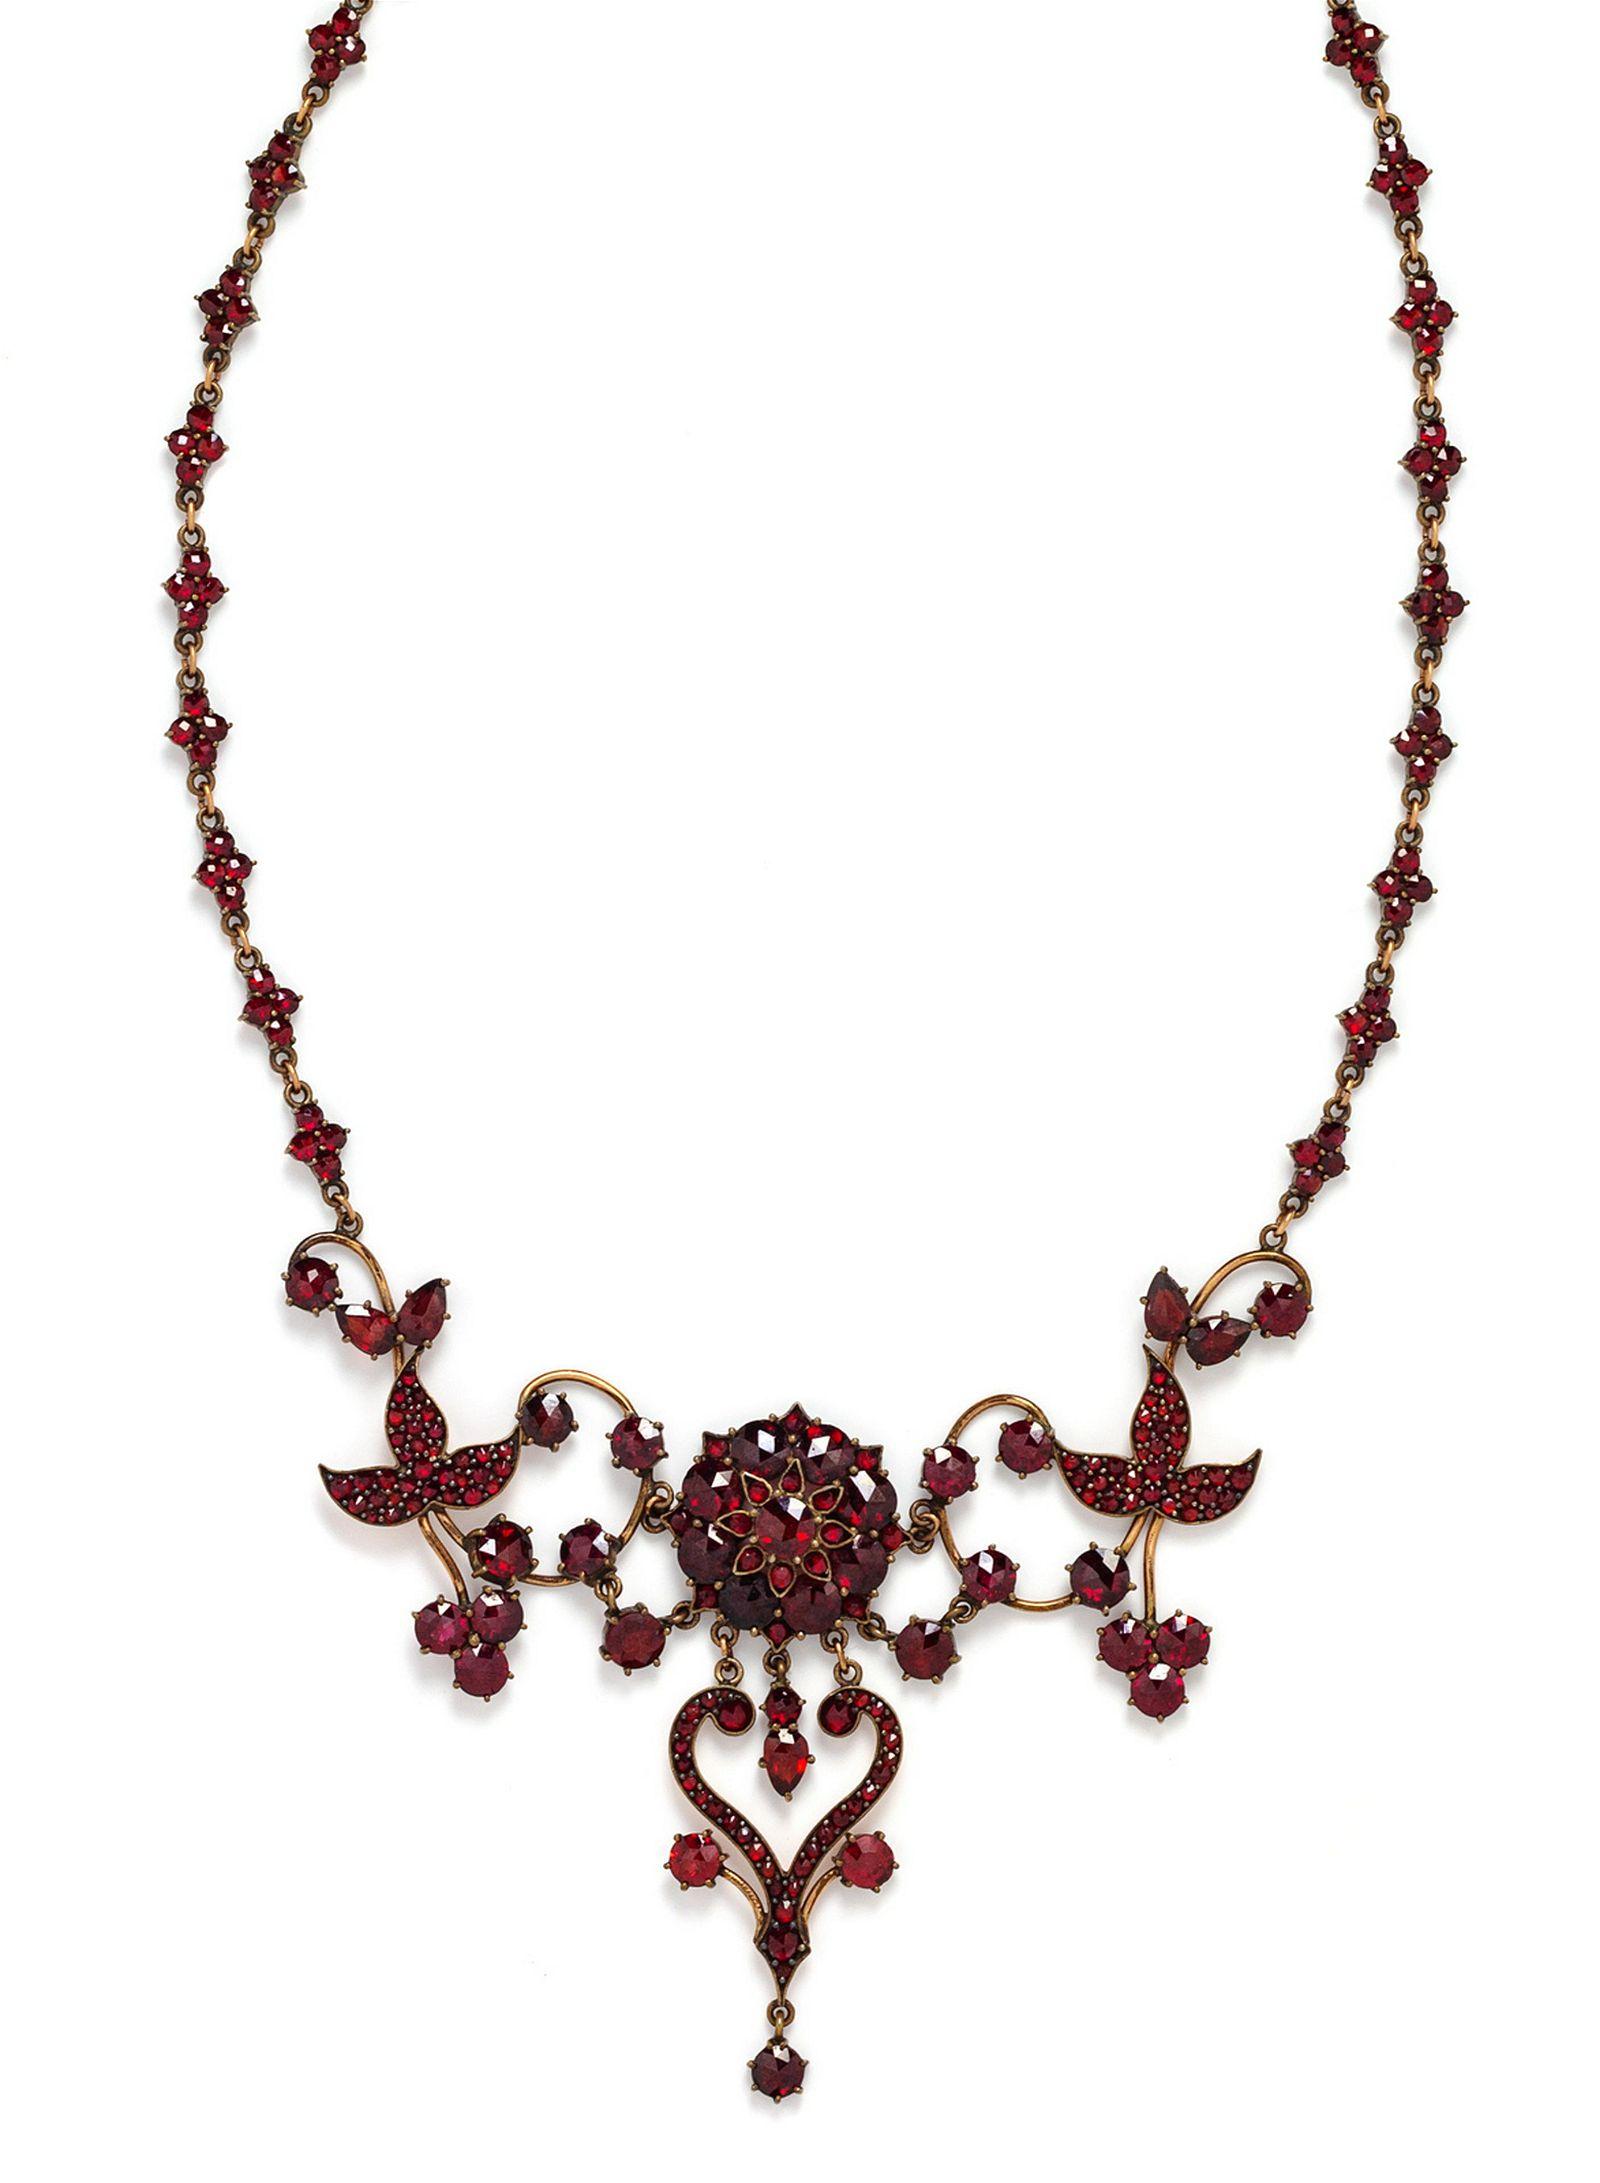 A Victorian Gold Filled Bohemian Garnet Necklace,